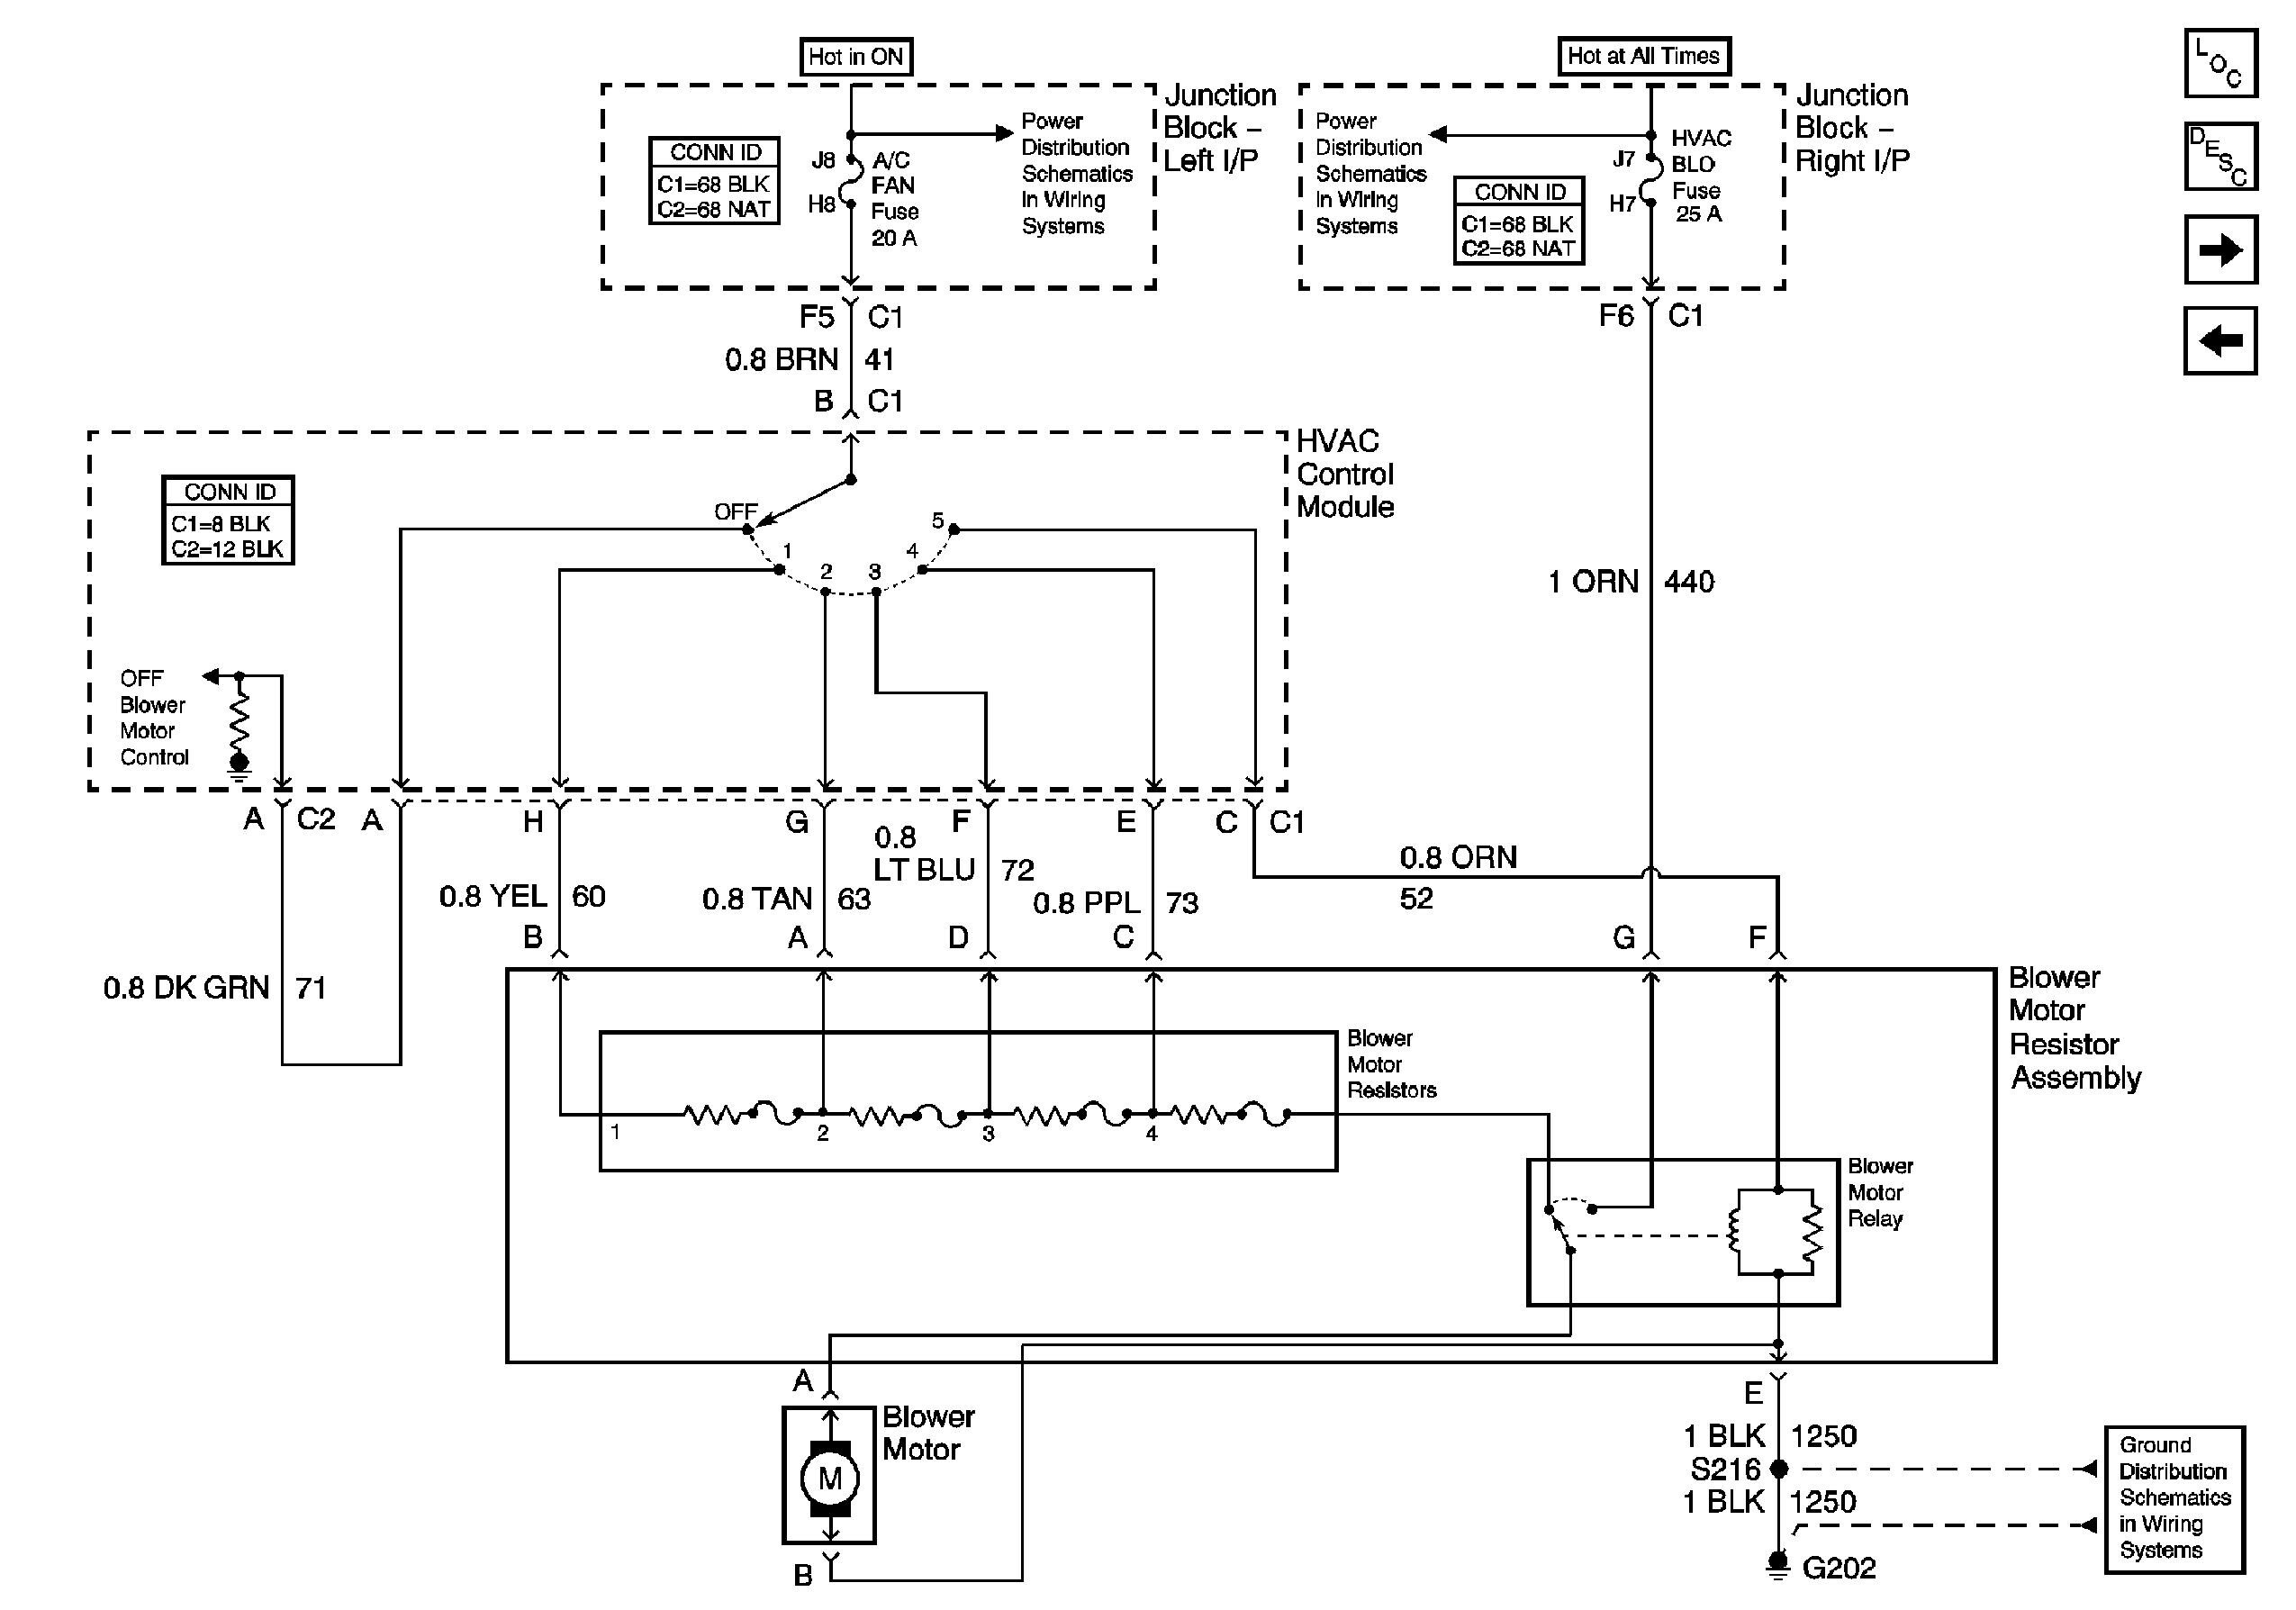 2001 Impala Wiring Schematic Automotive Wiring Harness On Ai 2000 Yenpancane Jeanjaures37 Fr